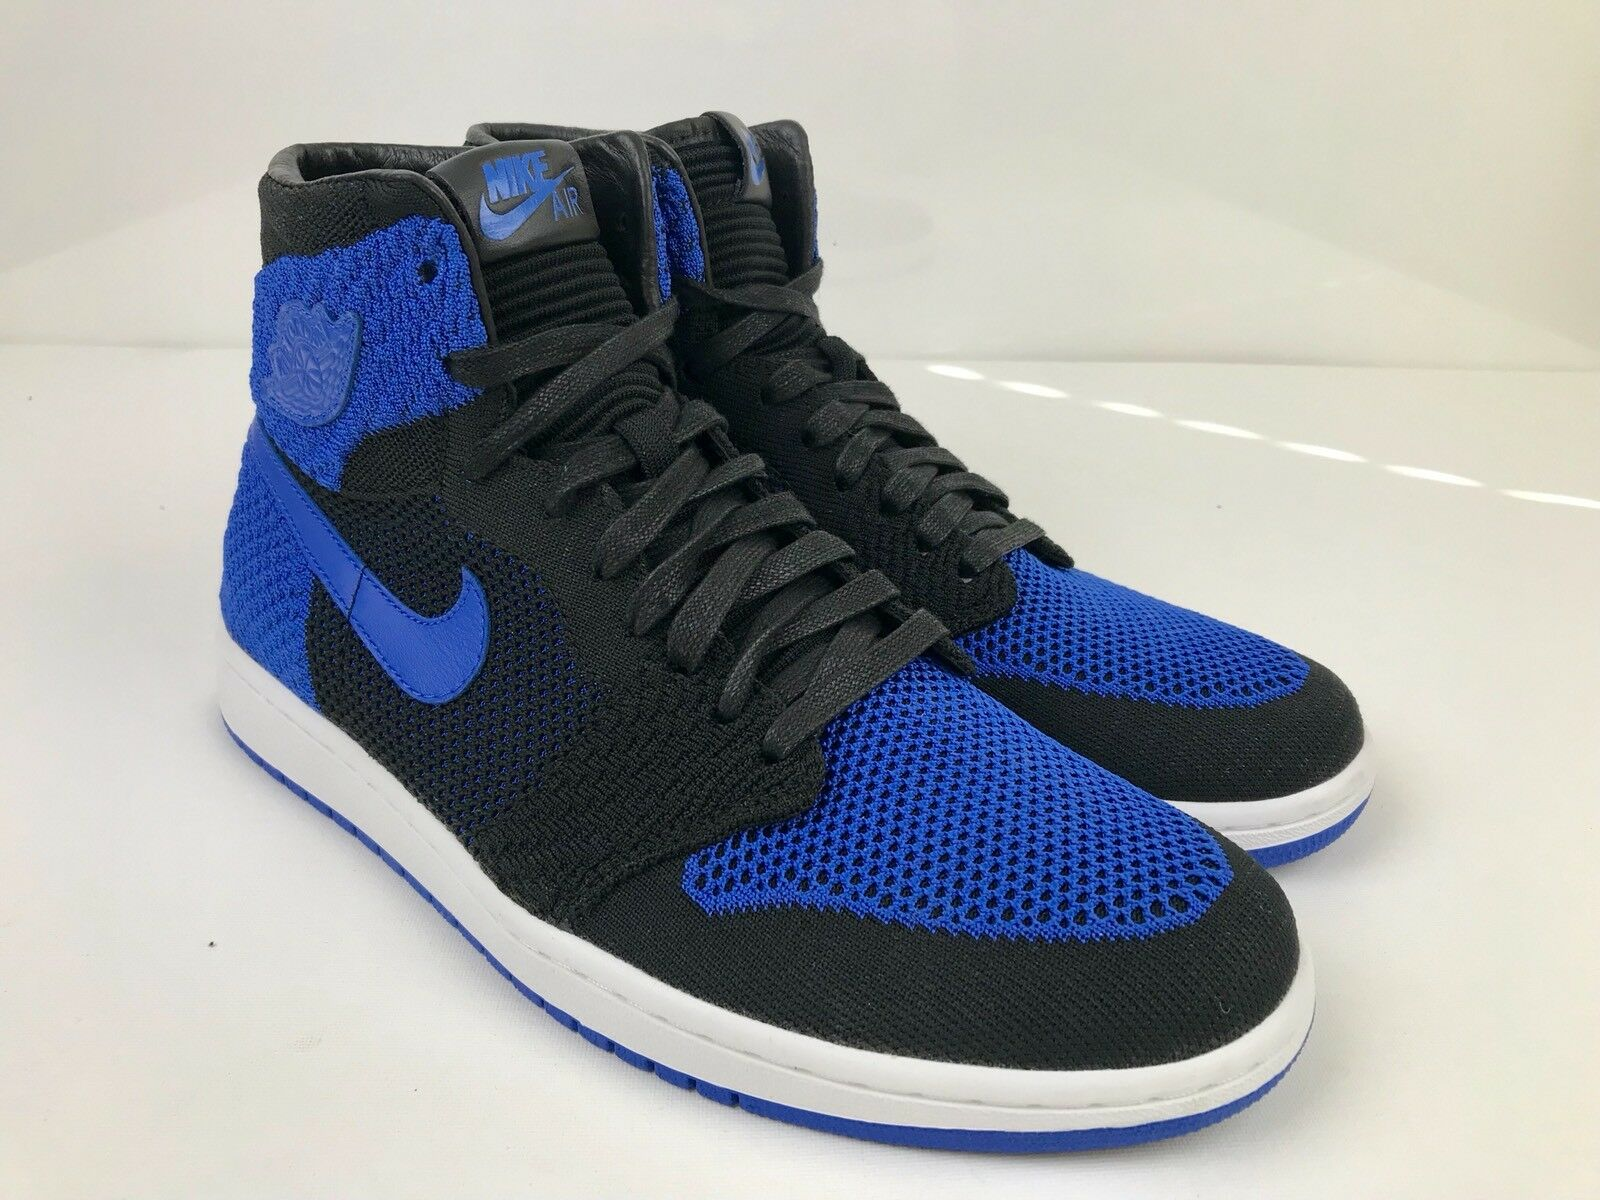 Nike Air Jordan 1 Retro High Flyknit Game Royal Size10 Nero/Blue 919704-006